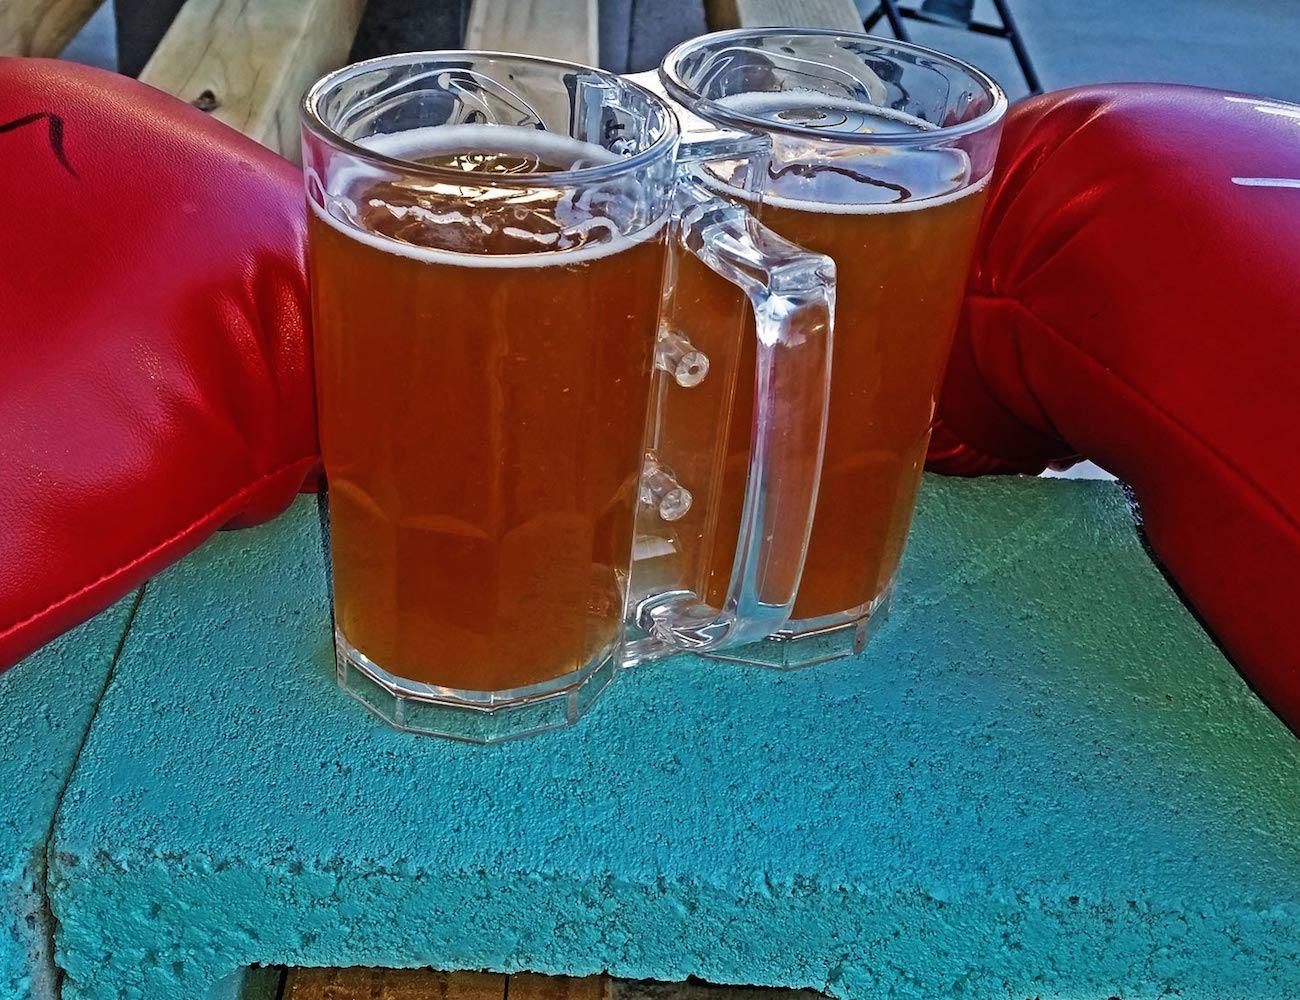 two-fisted-drinker-beer-mug-2